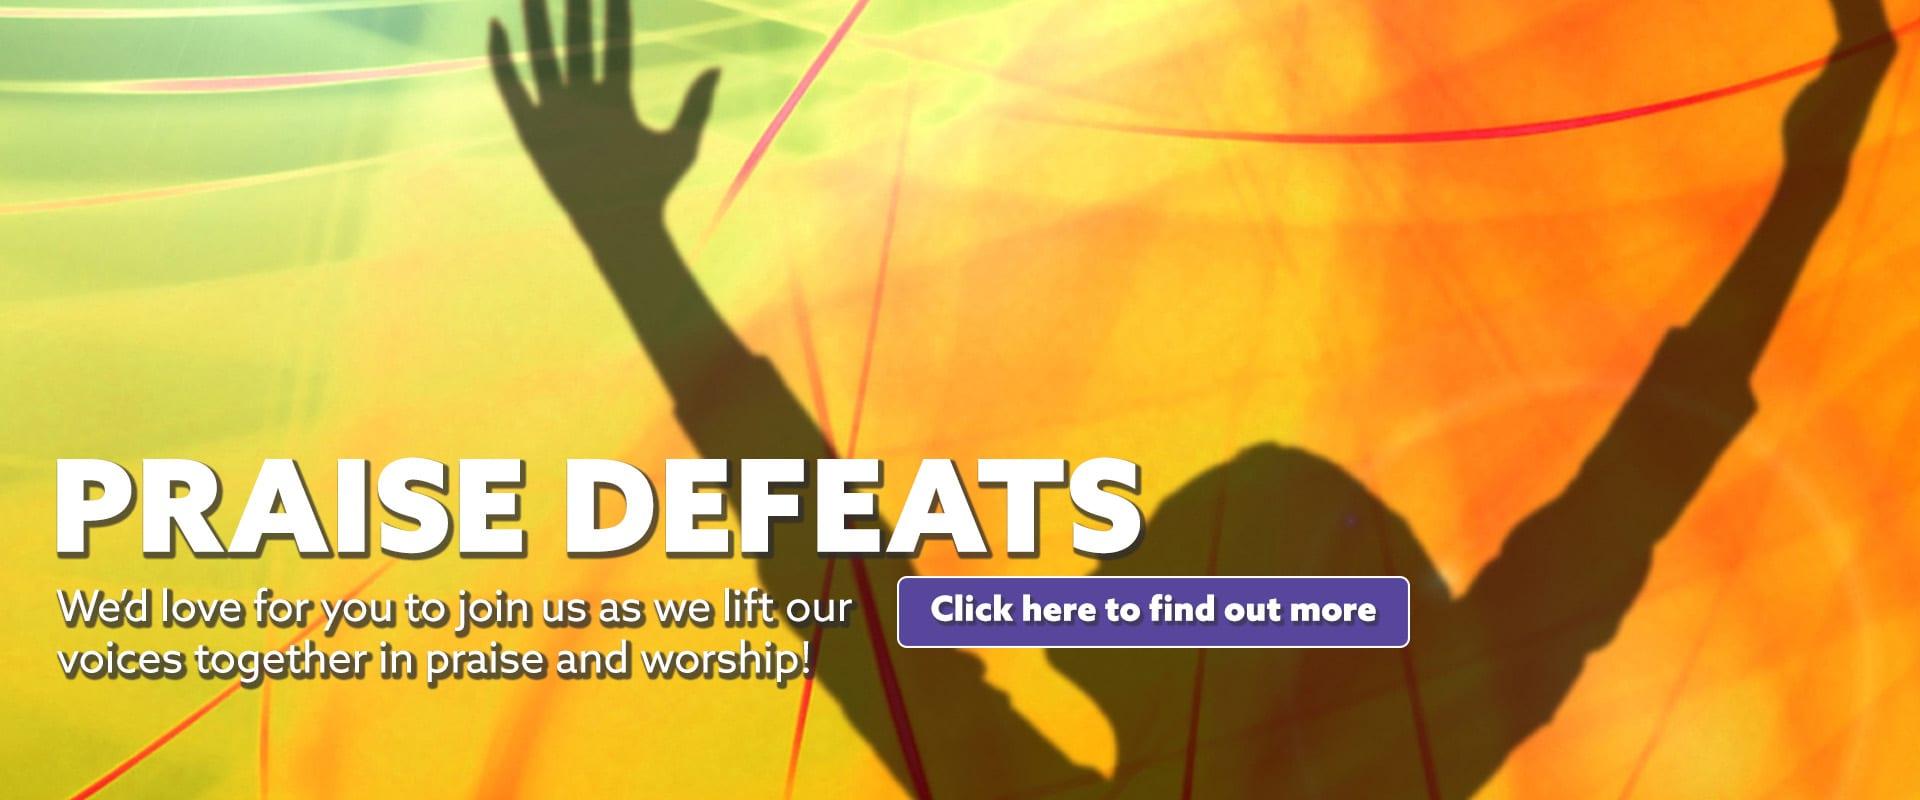 2020-Praise-Defeats-Lift-Worship